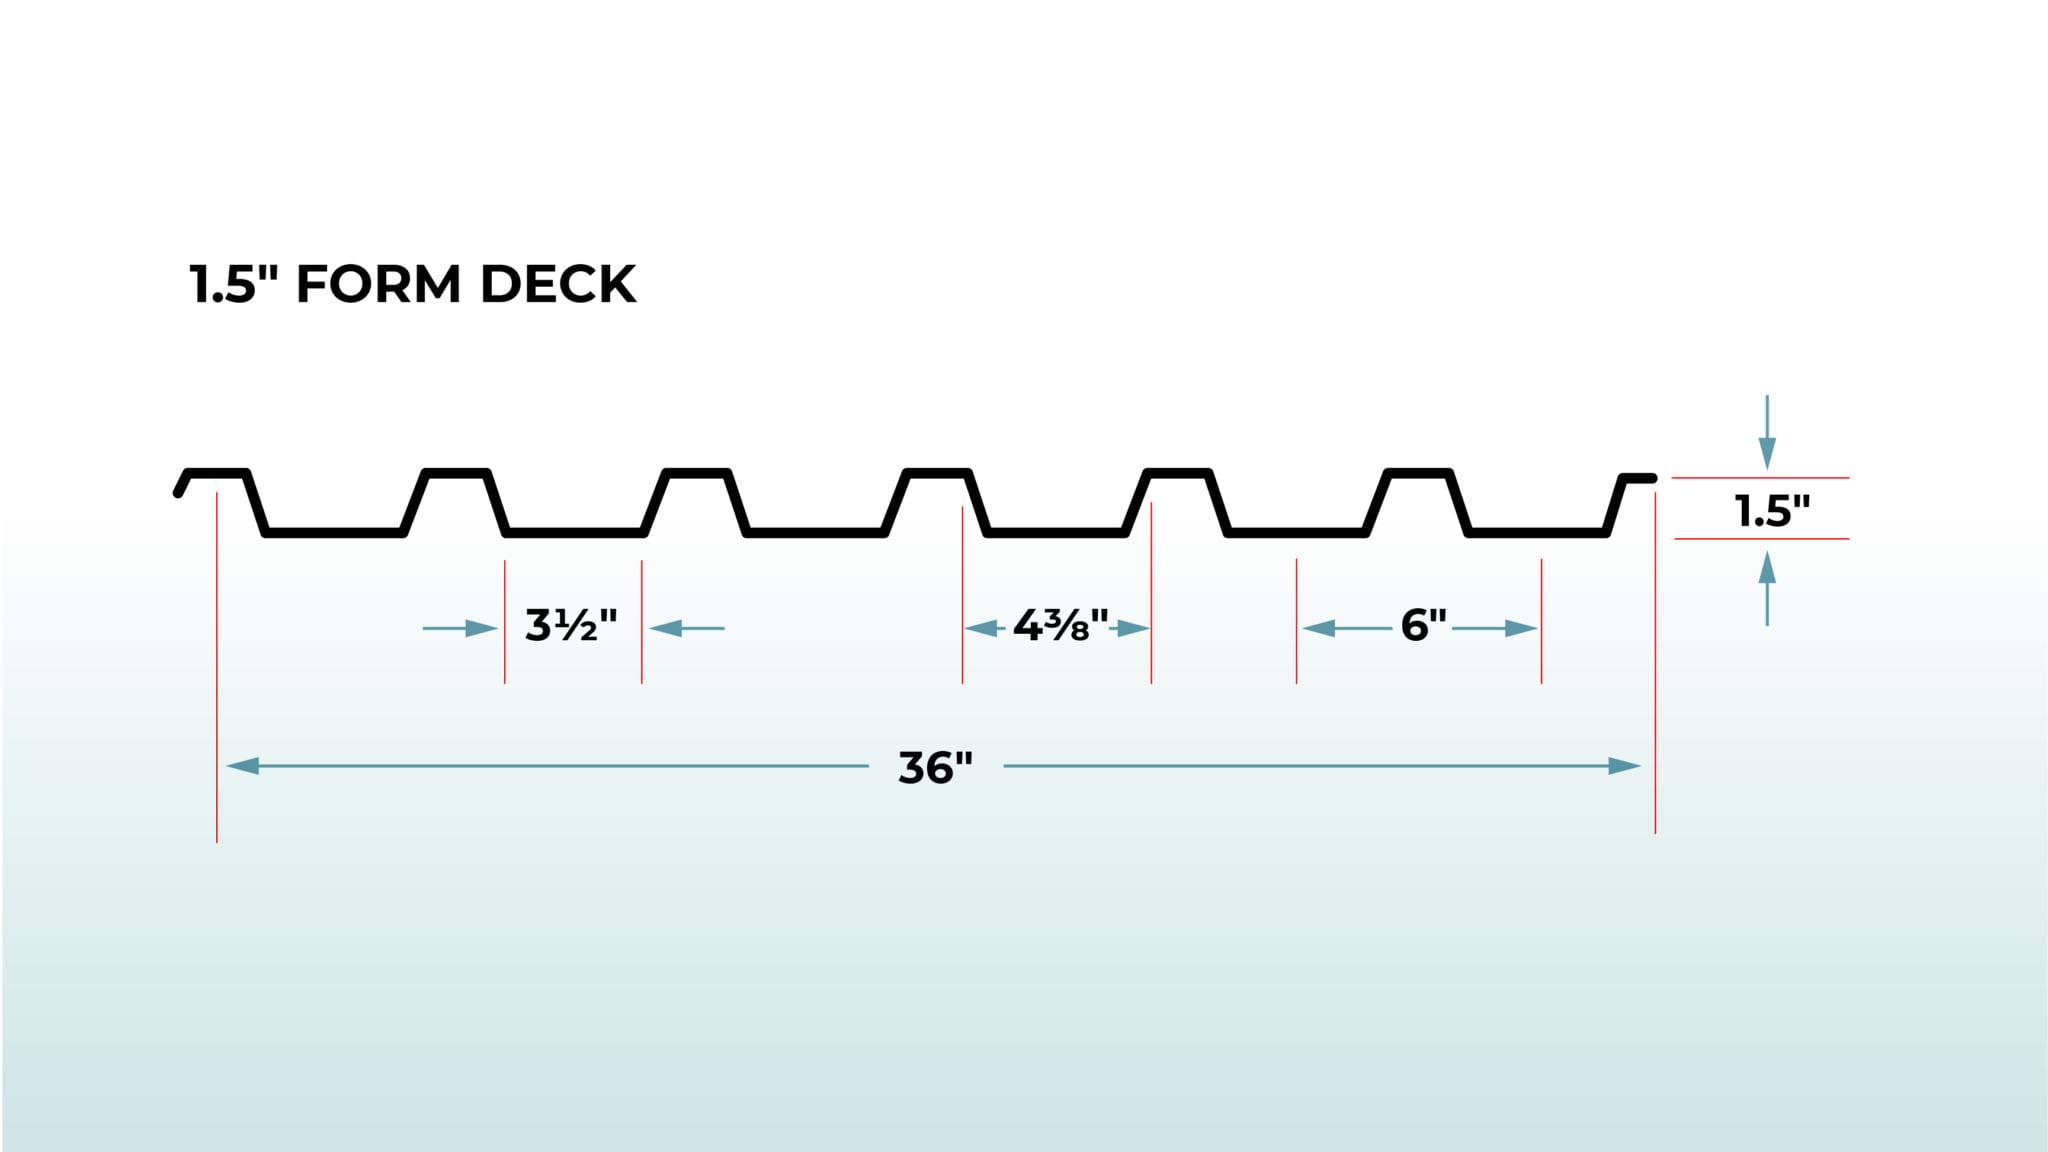 Form 1.5 inch deck